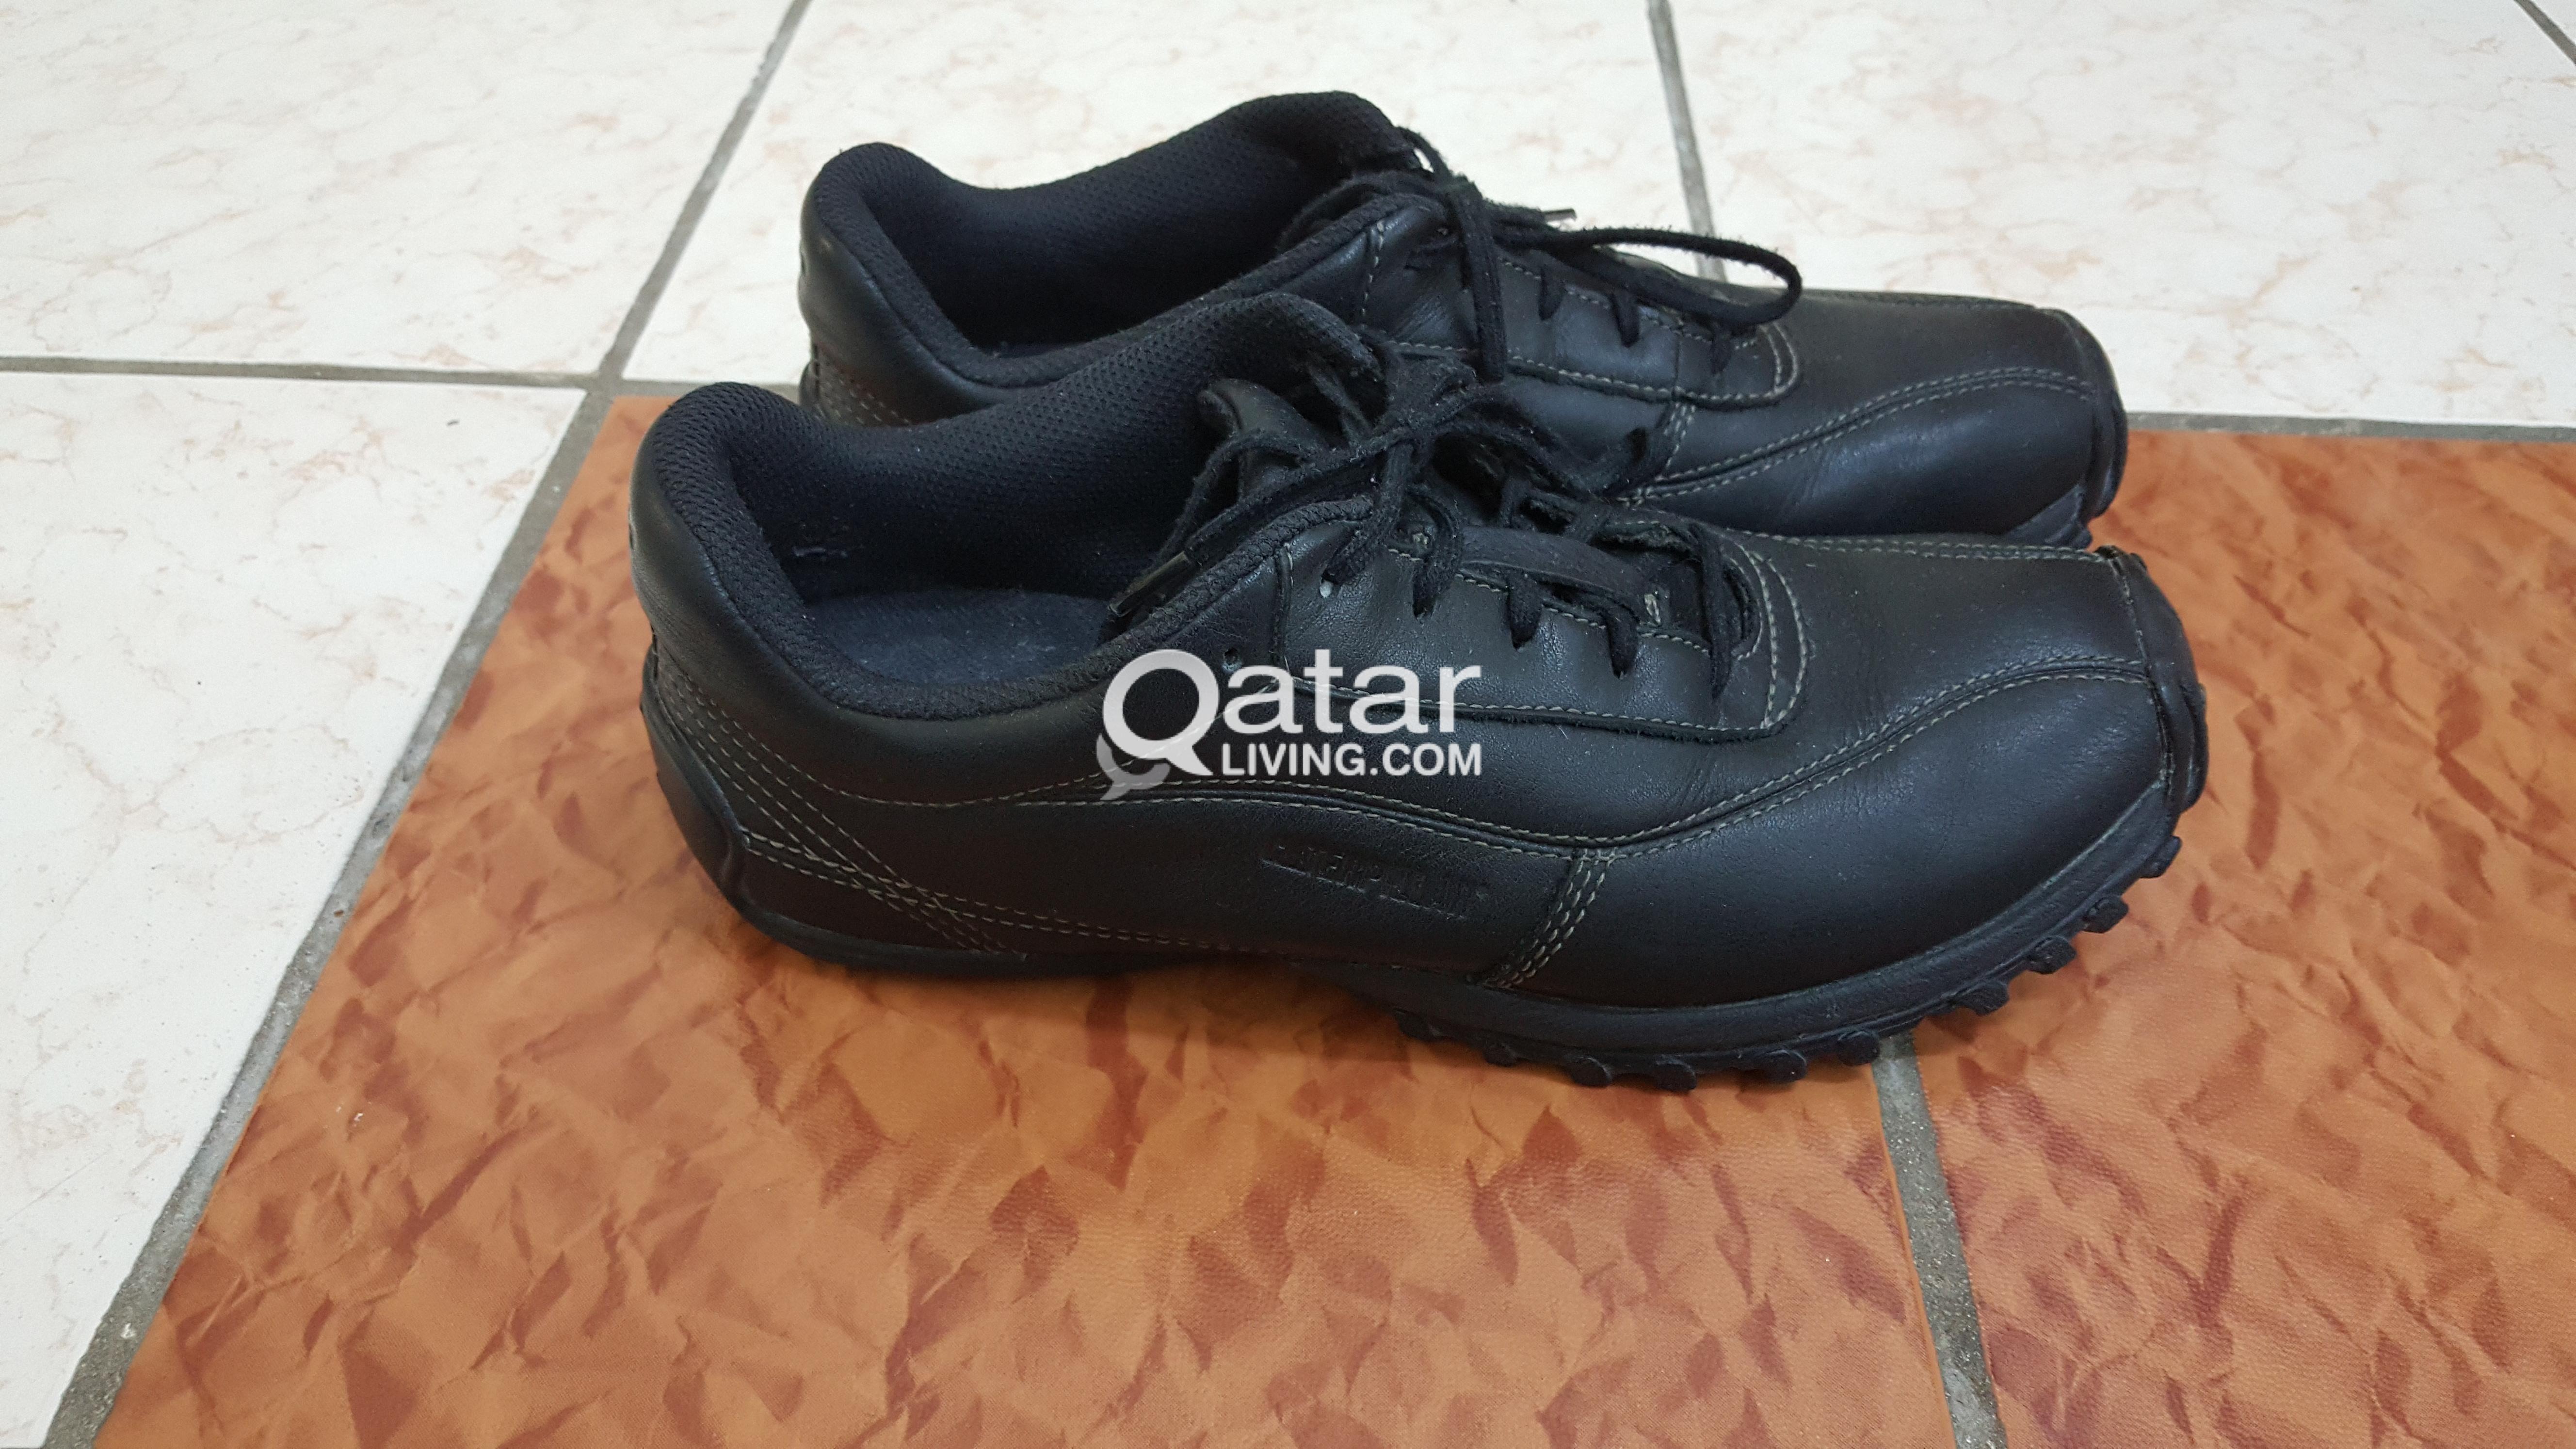 Caterpillar Footwear Qatar - Style Guru Fashion Glitz Glamour Style Unplugged